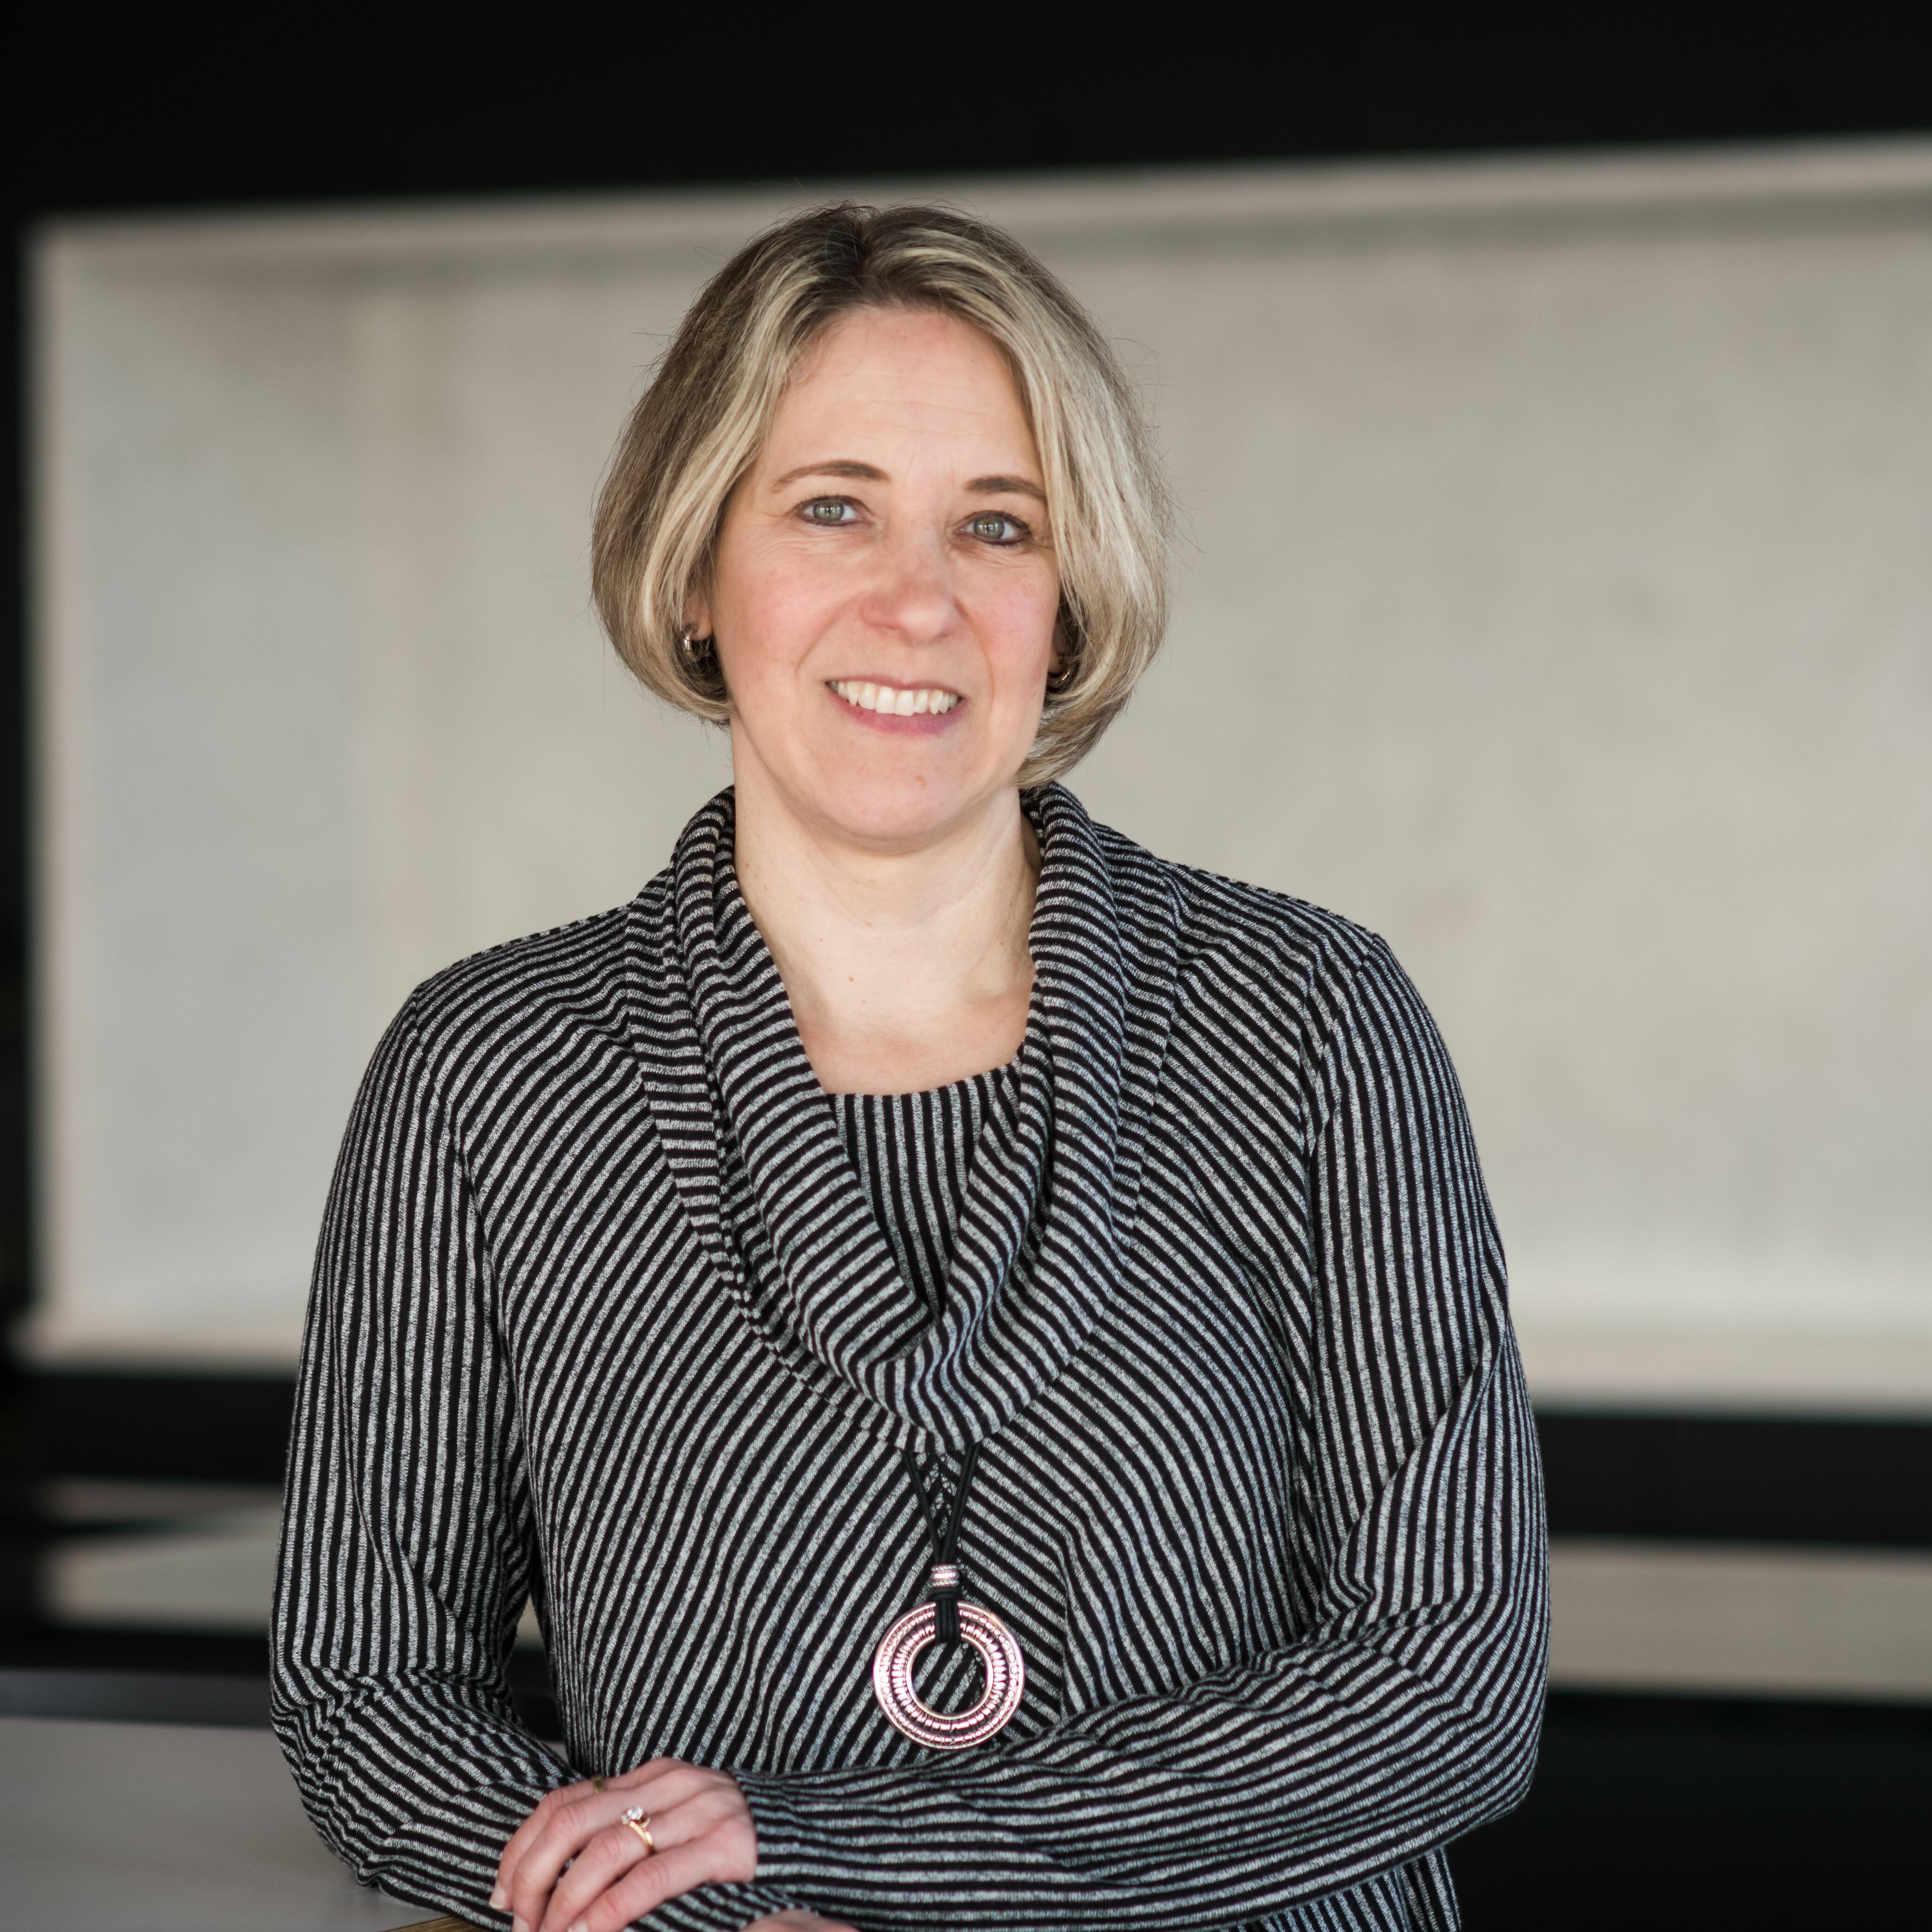 Beth Nordstrom